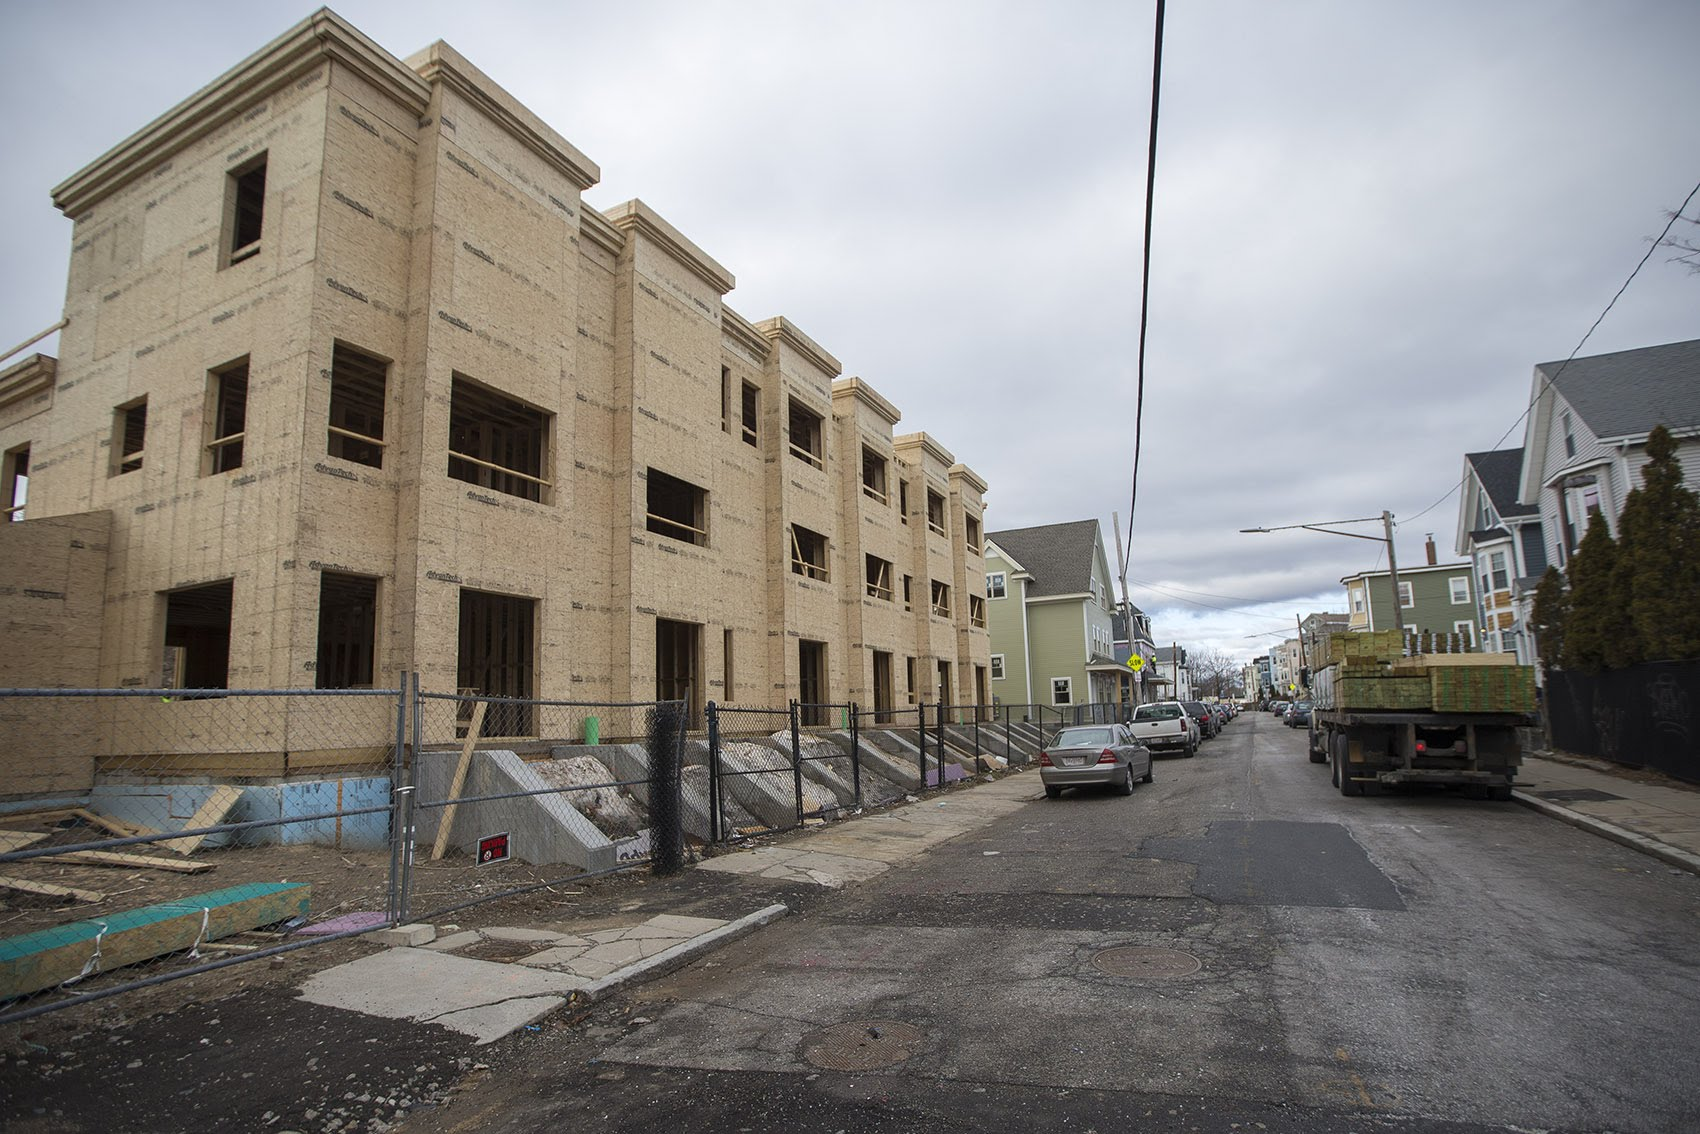 A new housing development being built on Edgewood Street in Dorchester. (Jesse Costa/WBUR)